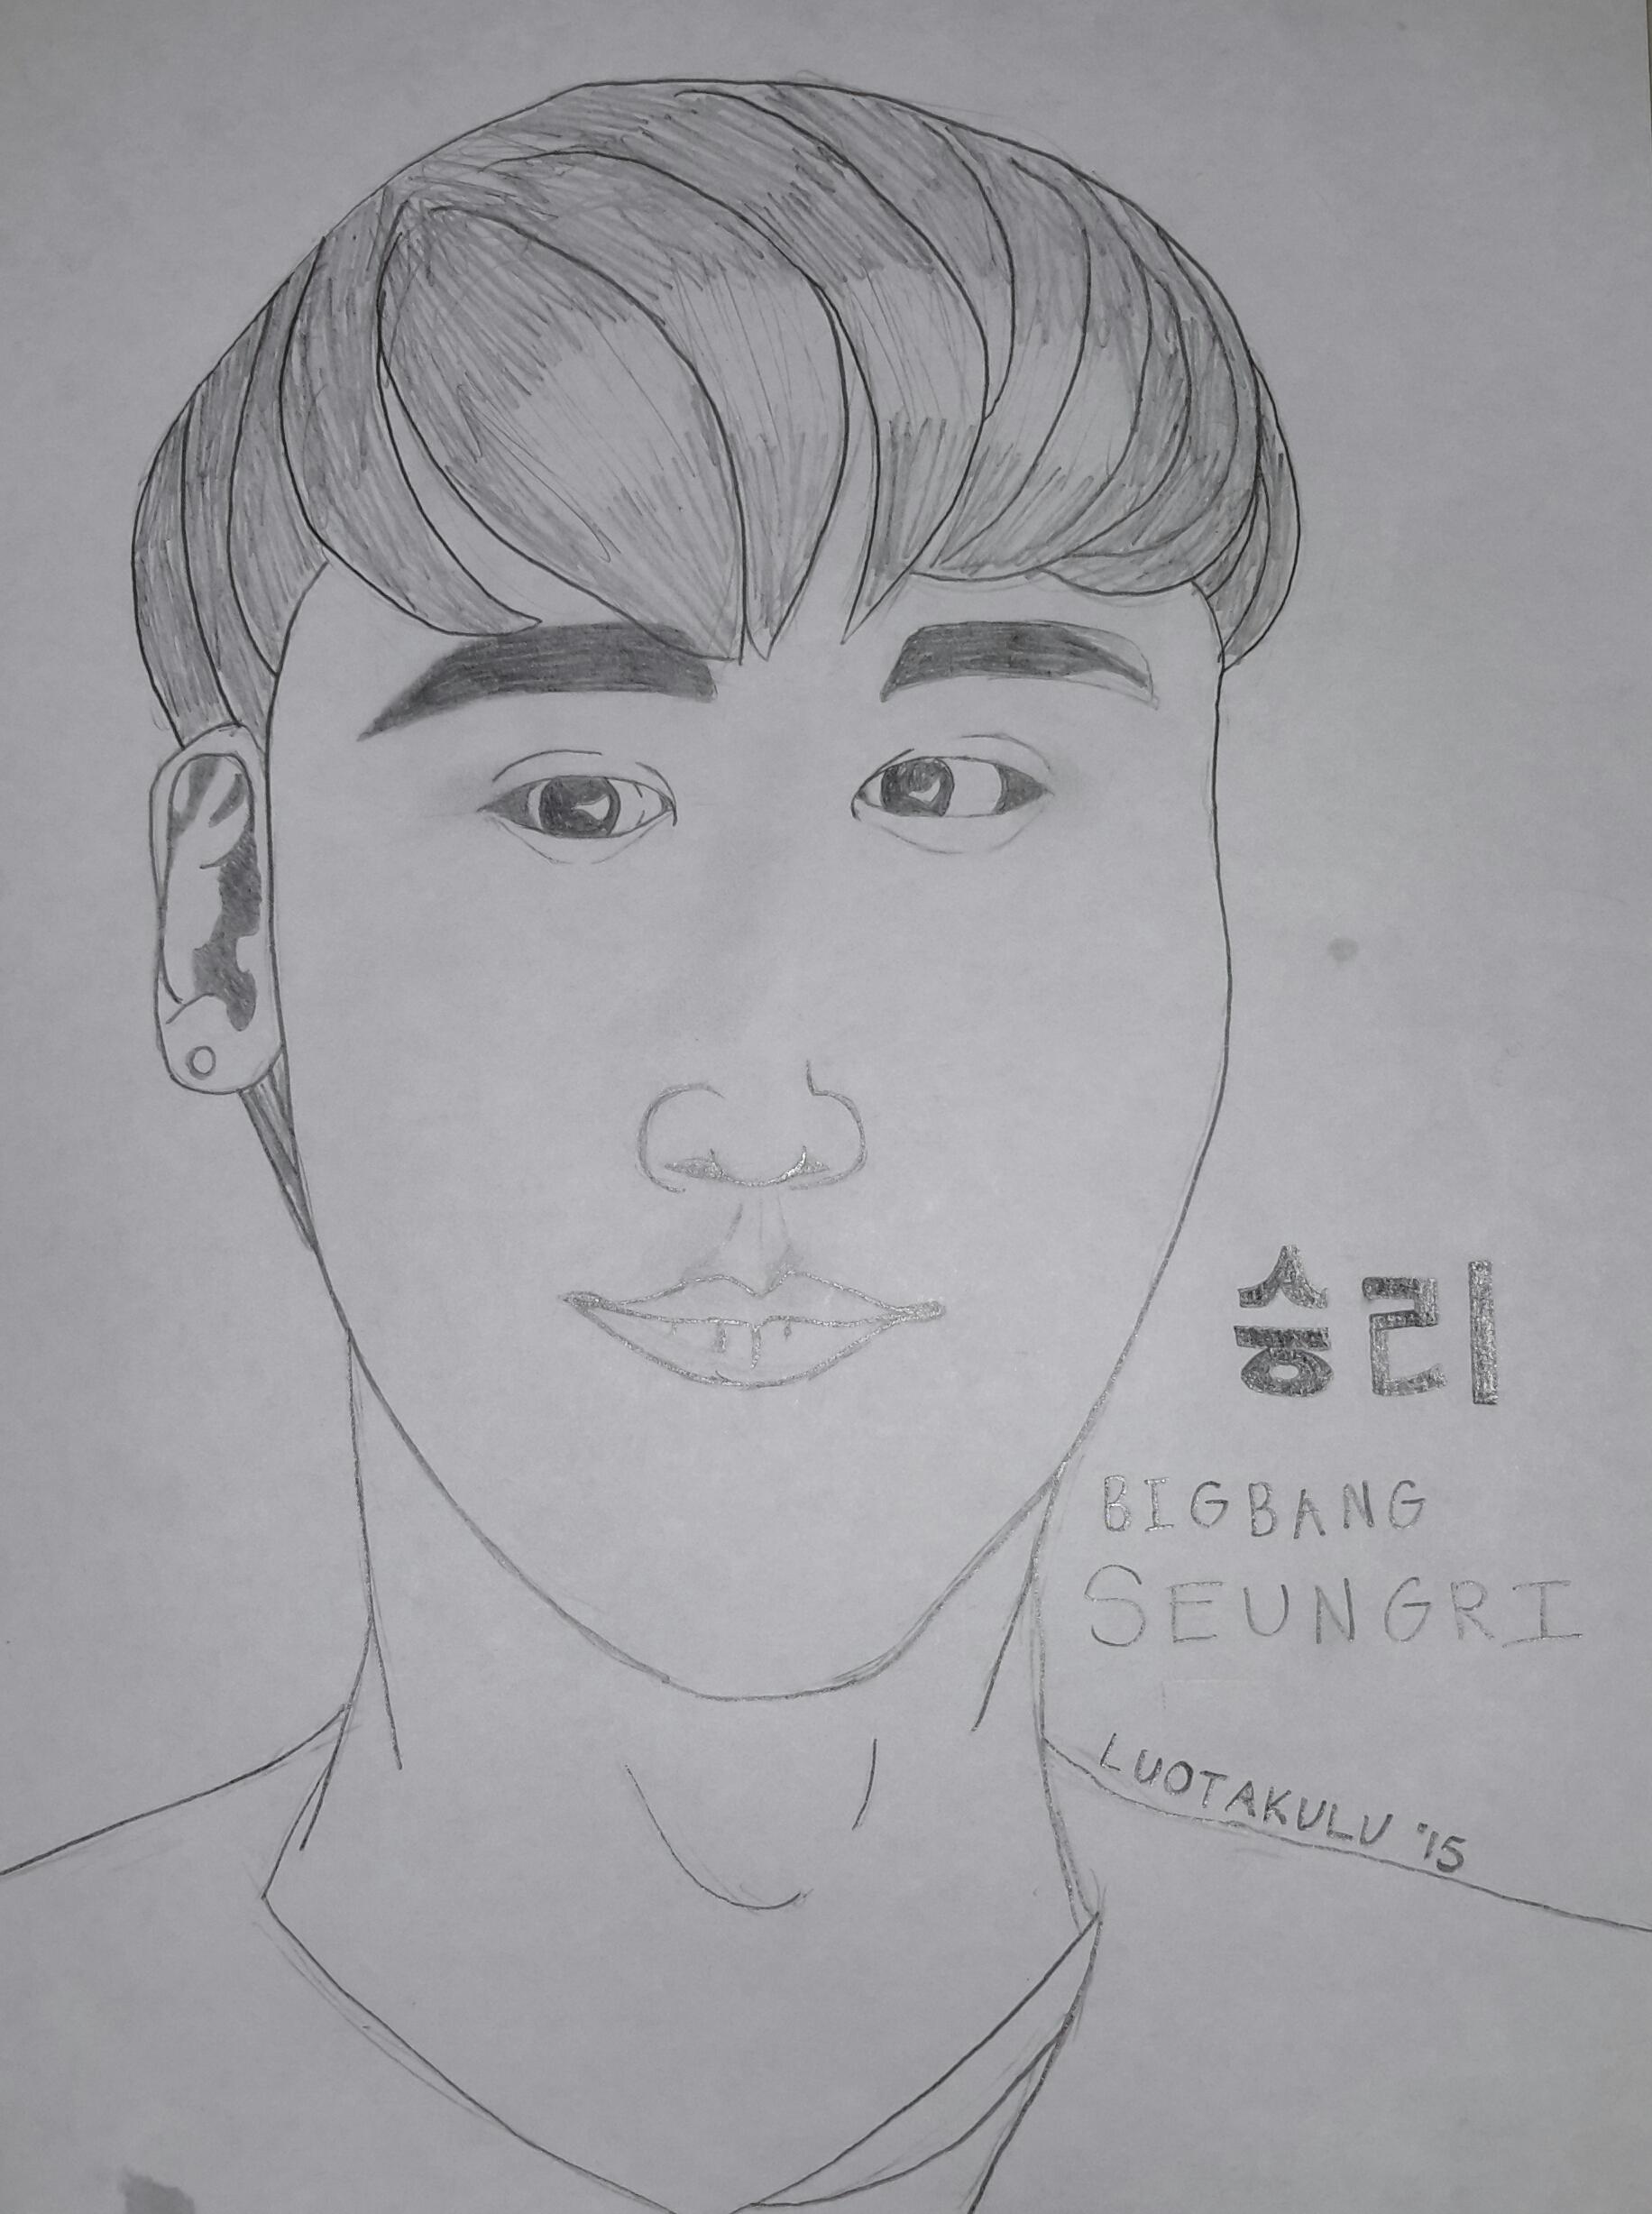 BIGBANG: Seungri by luotakulu